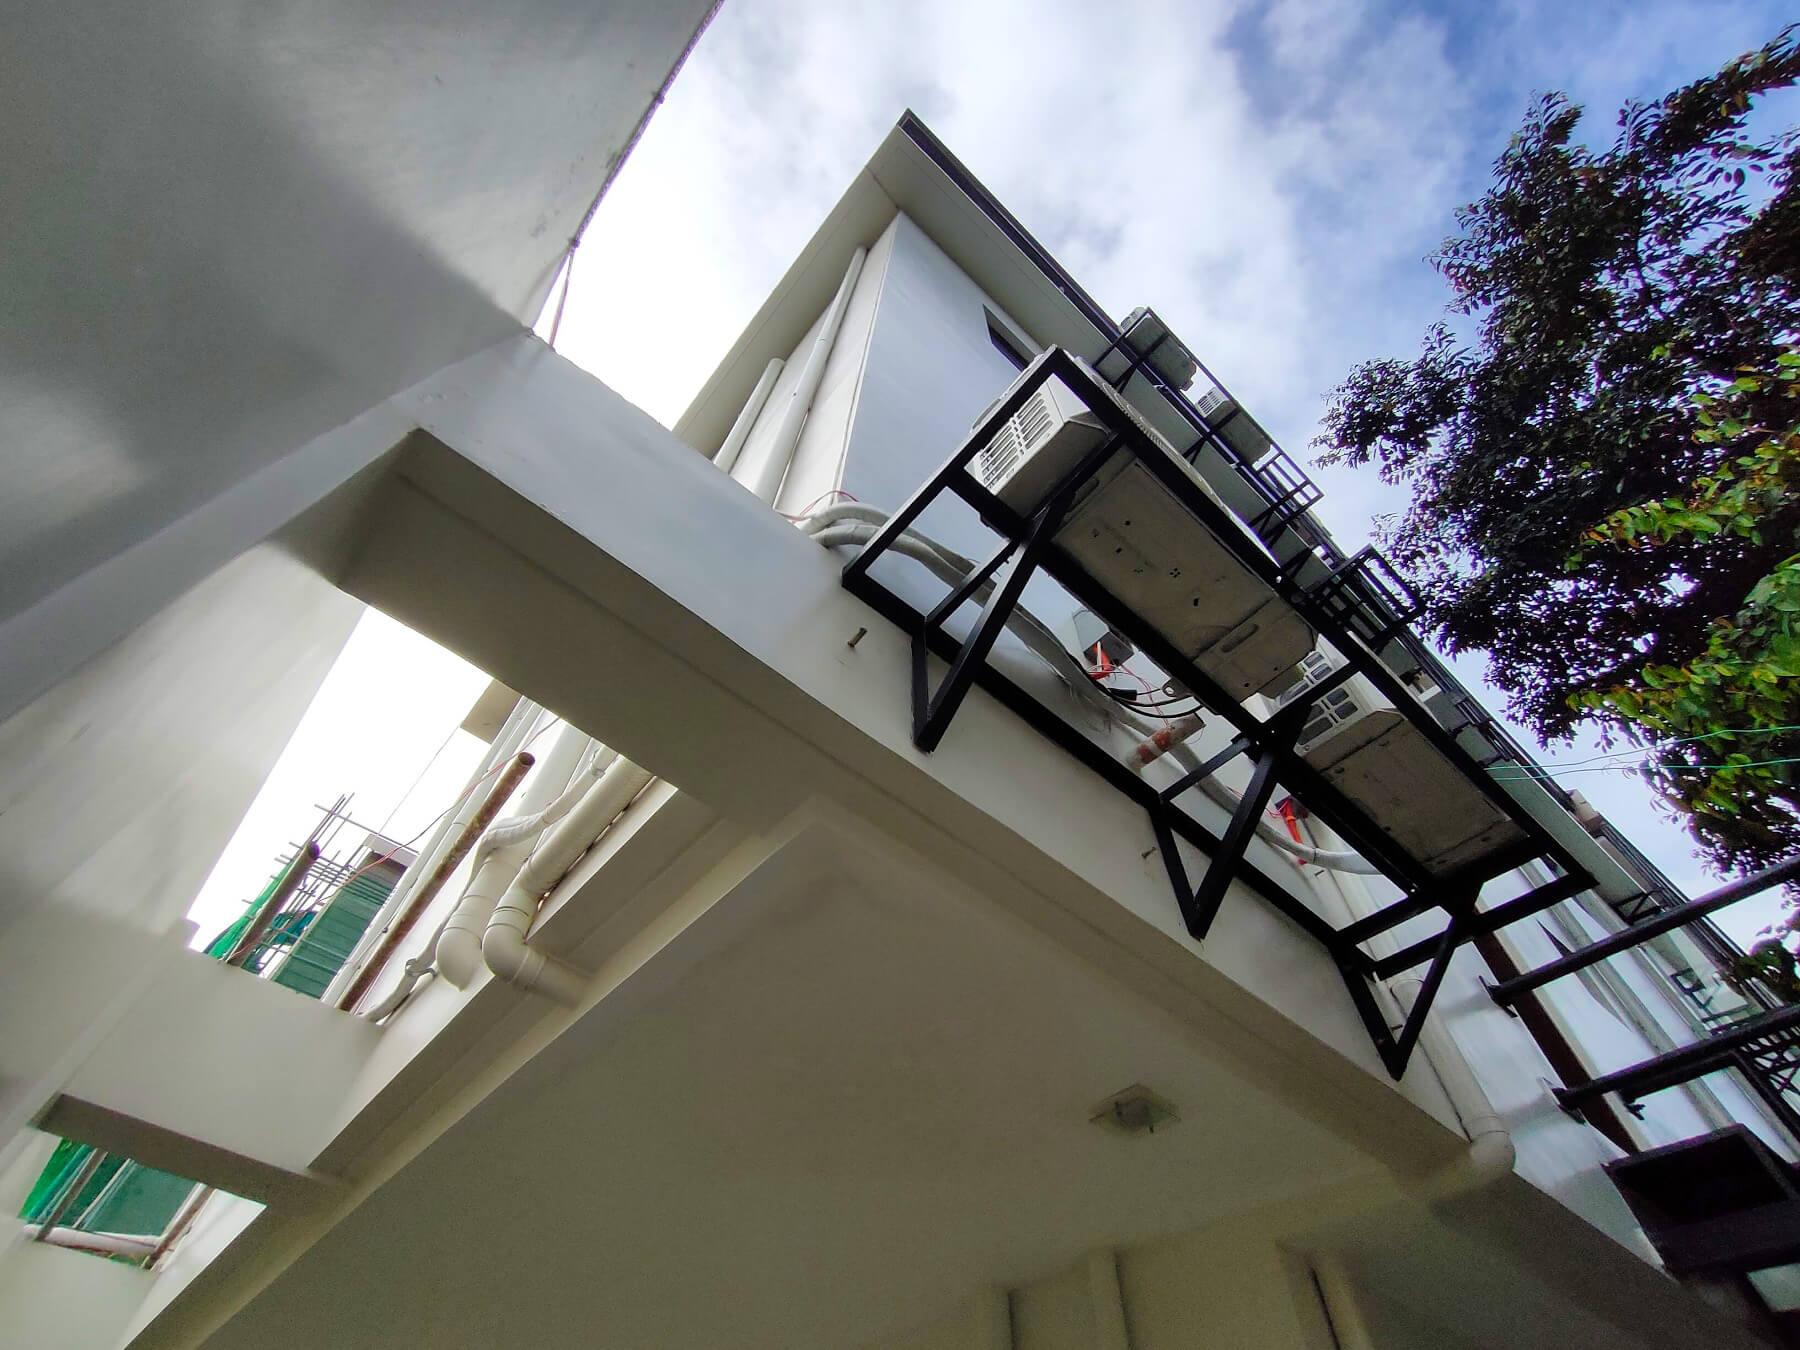 Brizlane Residences - Air-conditioning units